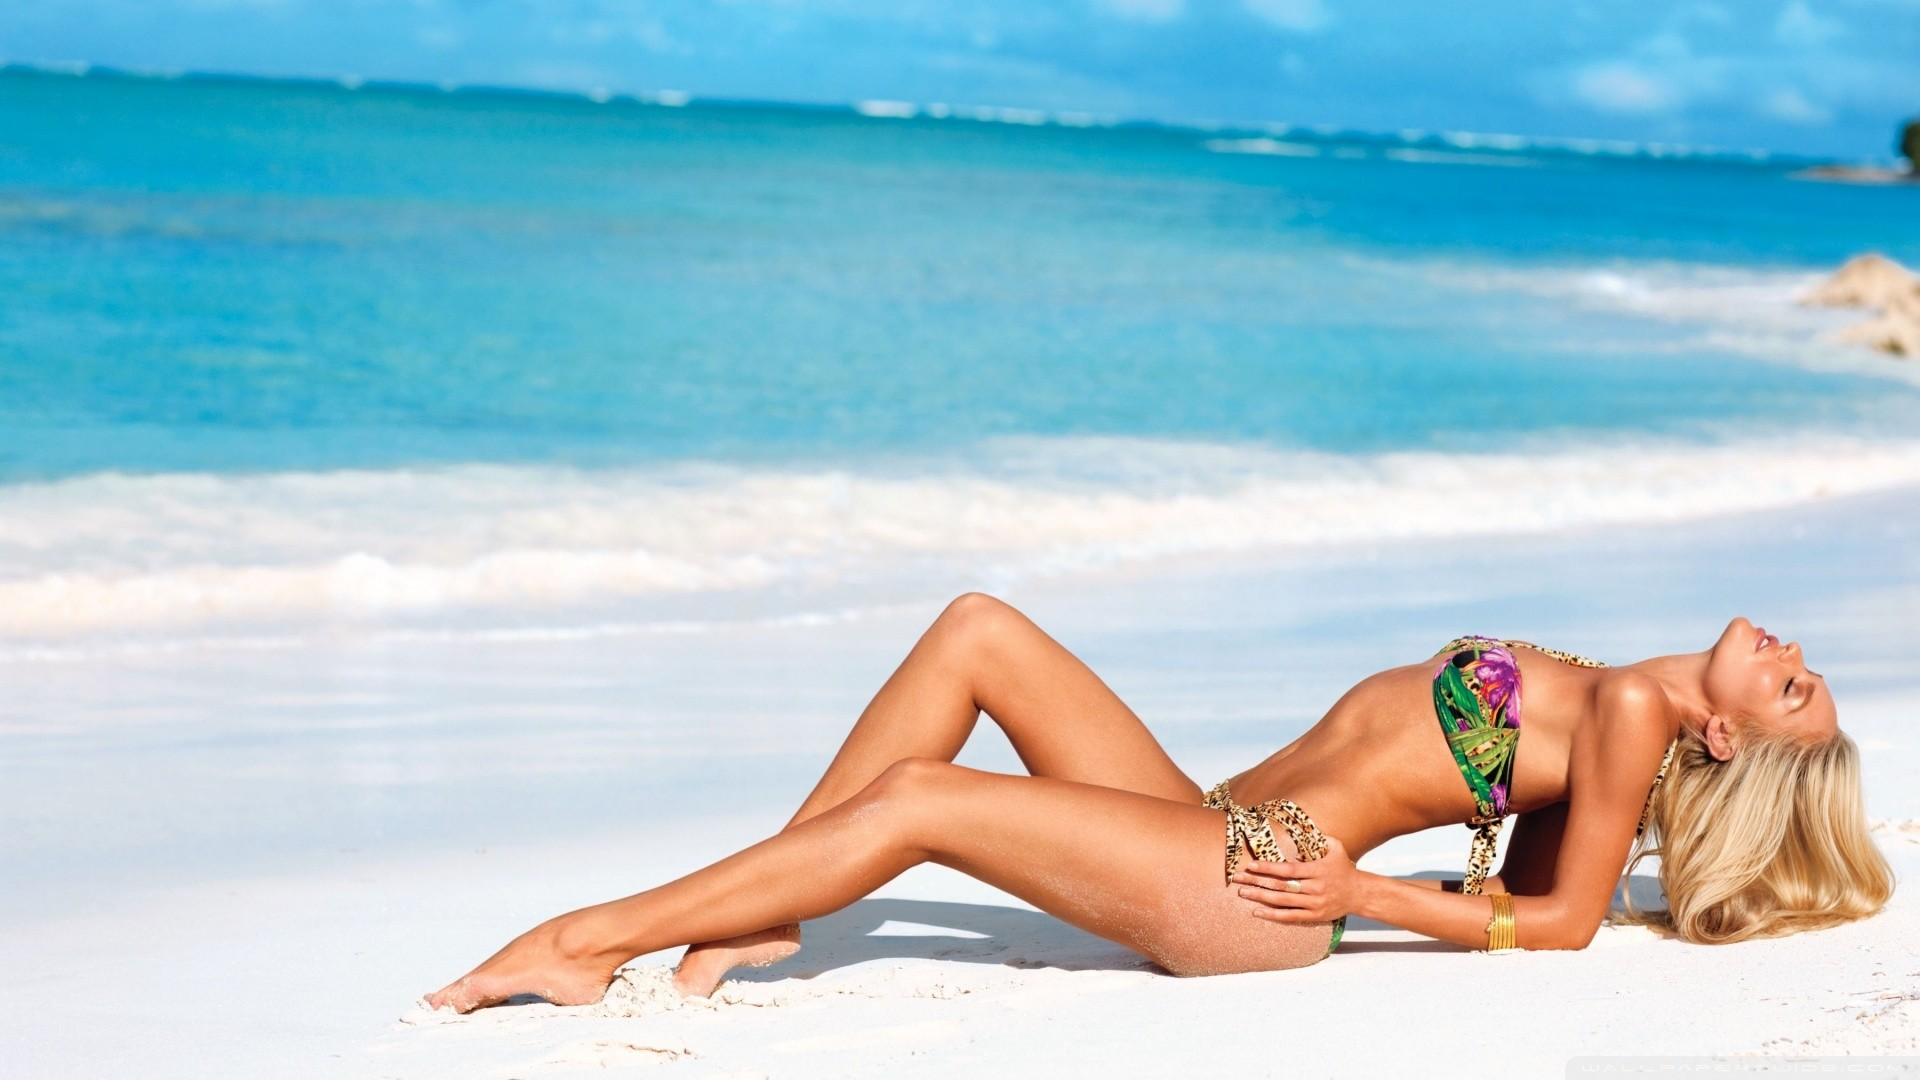 HD 16 9. Candice Swanepoel On The Beach HD desktop wallpaper Widescreen